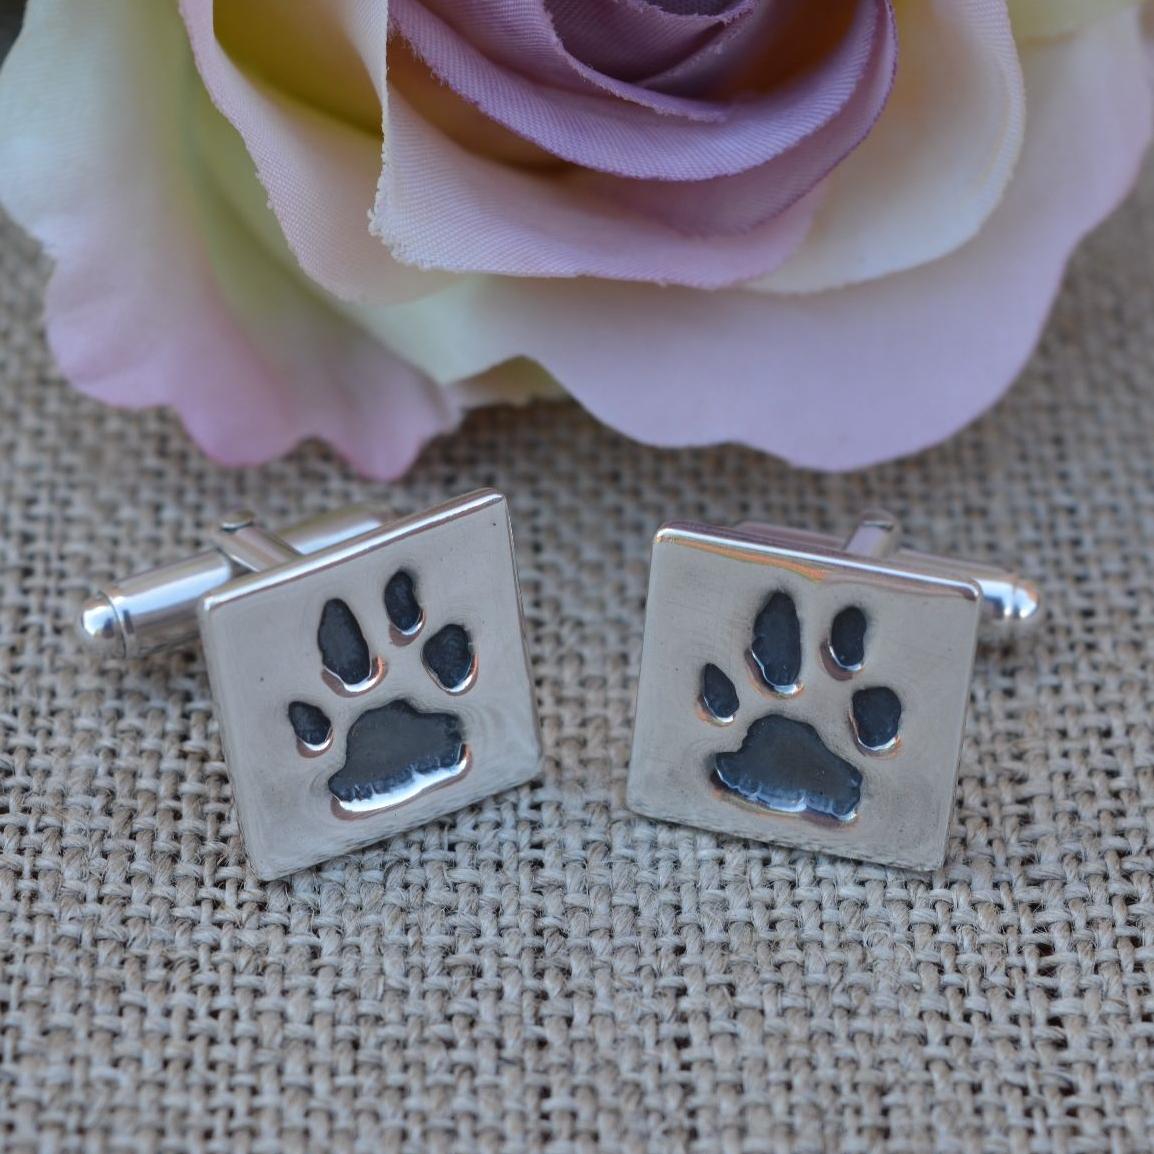 silver paw print cufflinks square